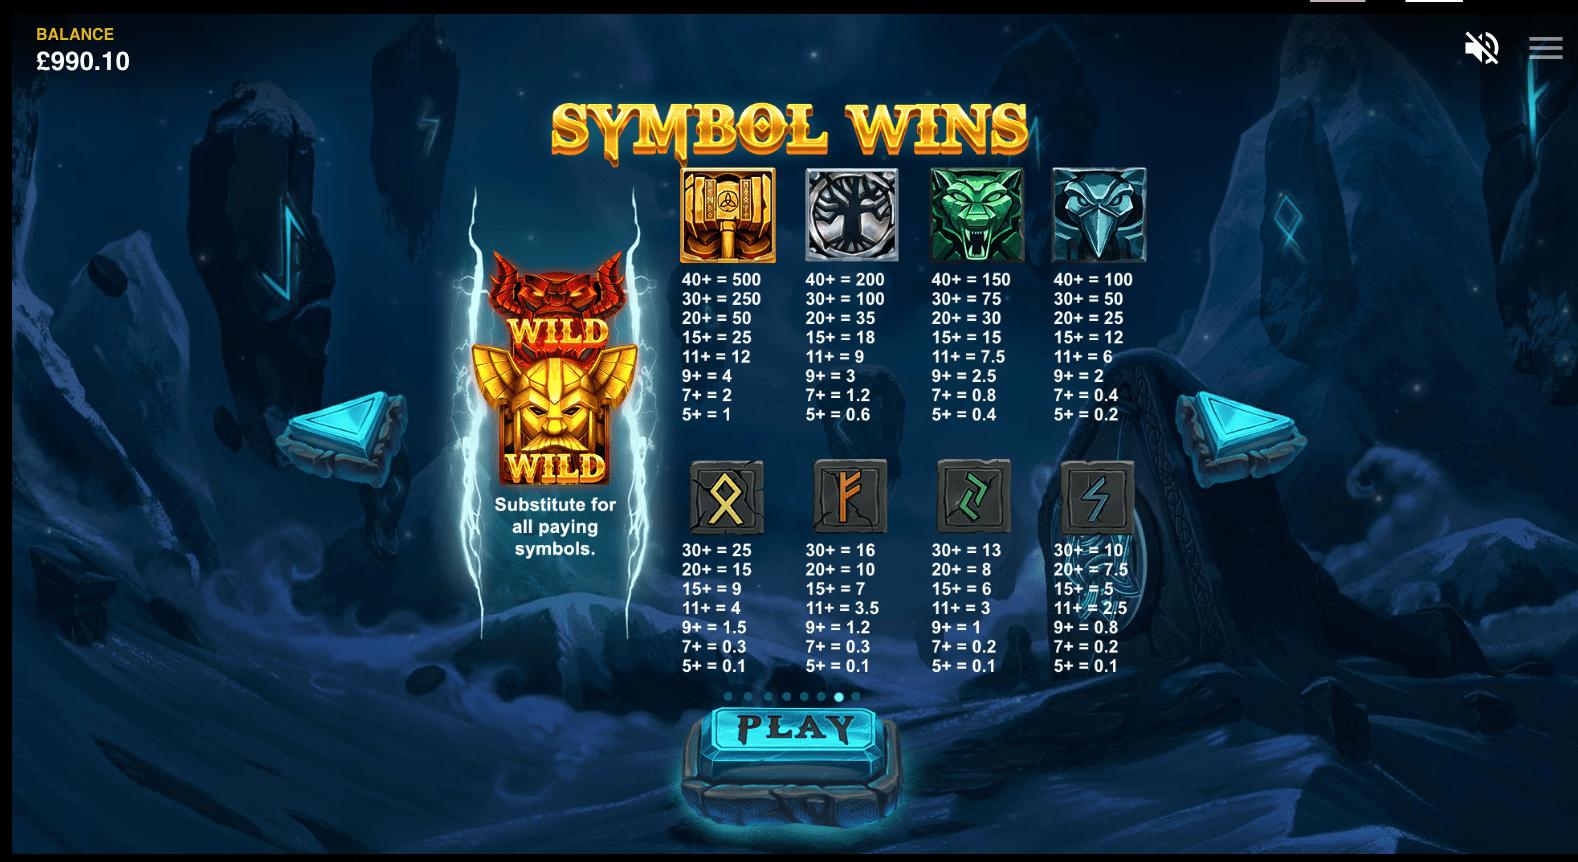 Thor's Lightning Slot symbols